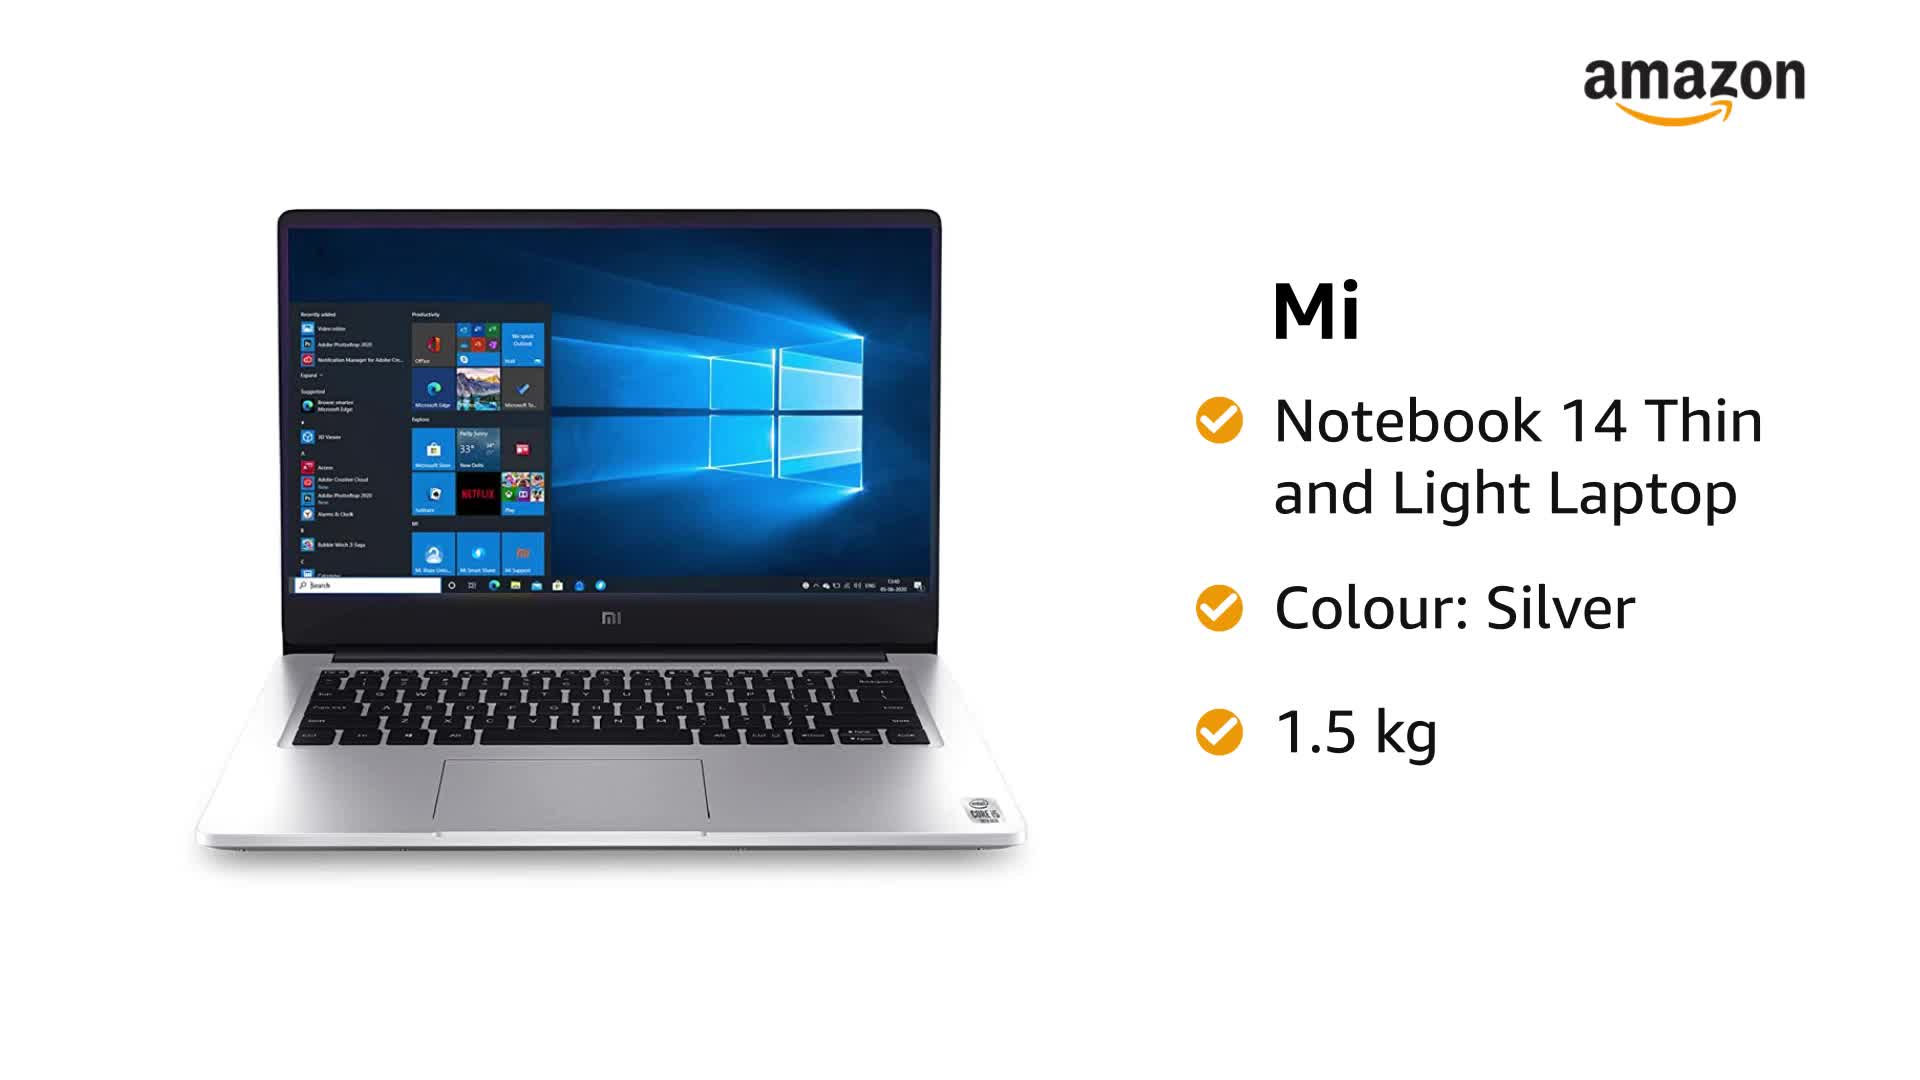 Mi Notebook 14 Intel Core i5-10210U 10th Gen Thin and Light Laptop(8GB/512GB SSD/Windows 10/Intel UHD Graphics/Silver/1… 2 51fB7RnO4HL